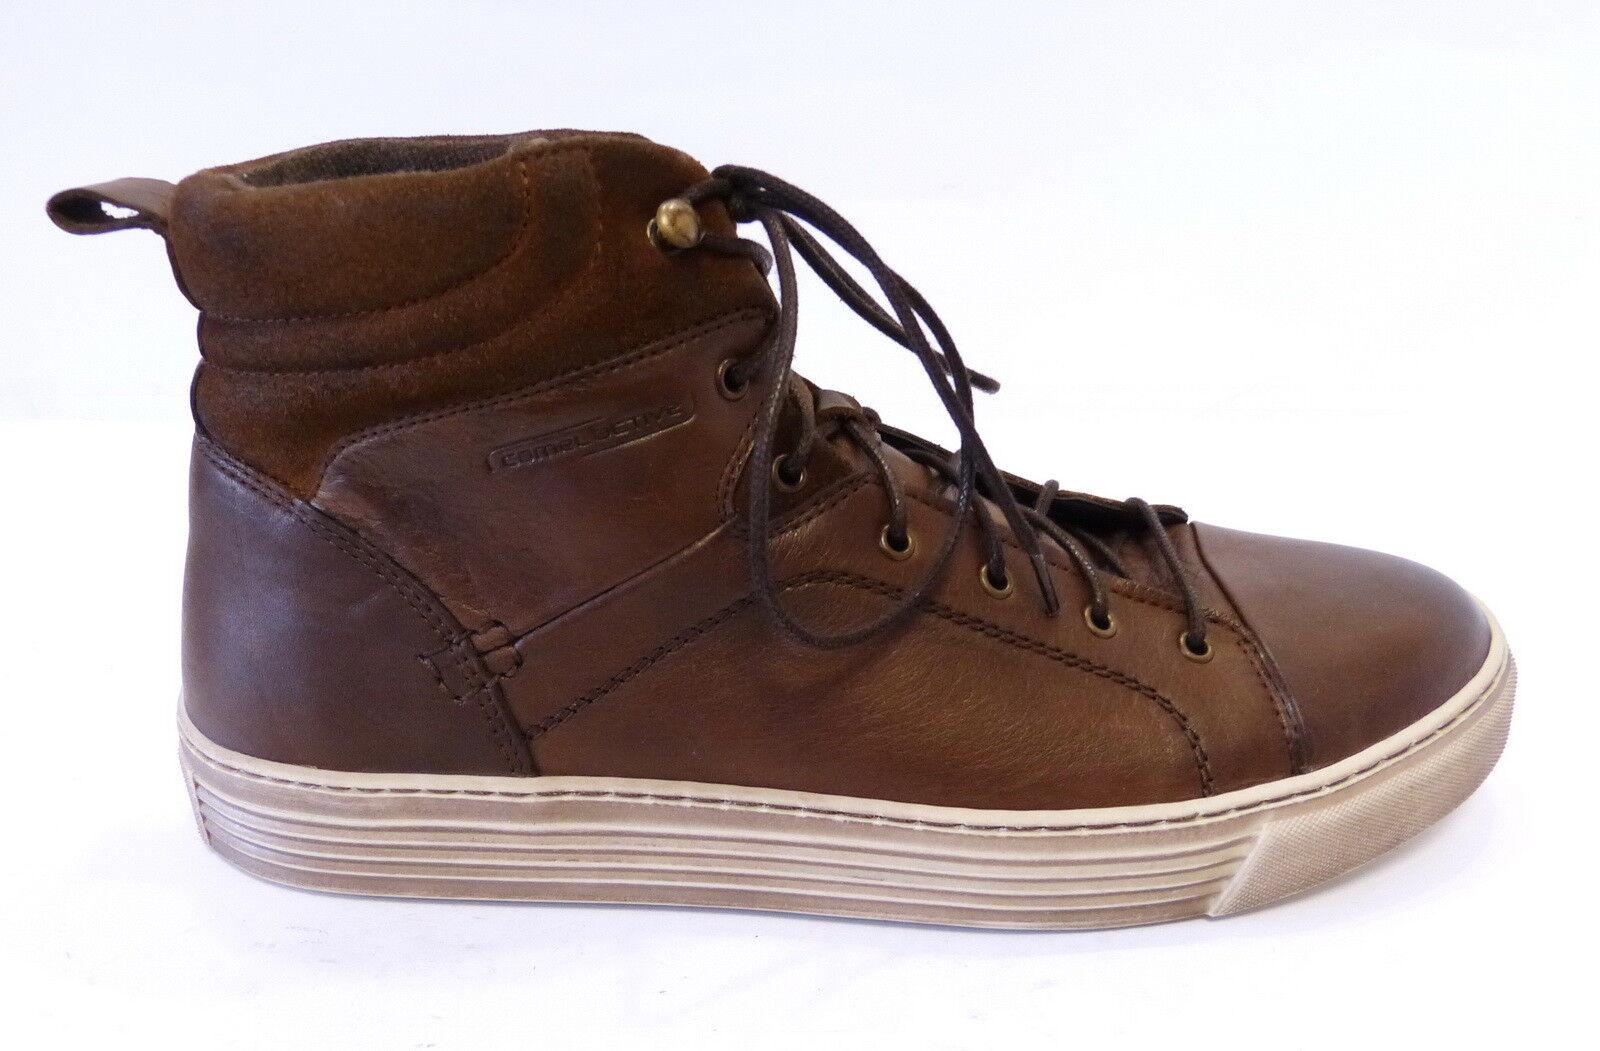 Camel Active Trend High Top Schnür Sneaker Bowl 42912 01 bison braun nut Leder